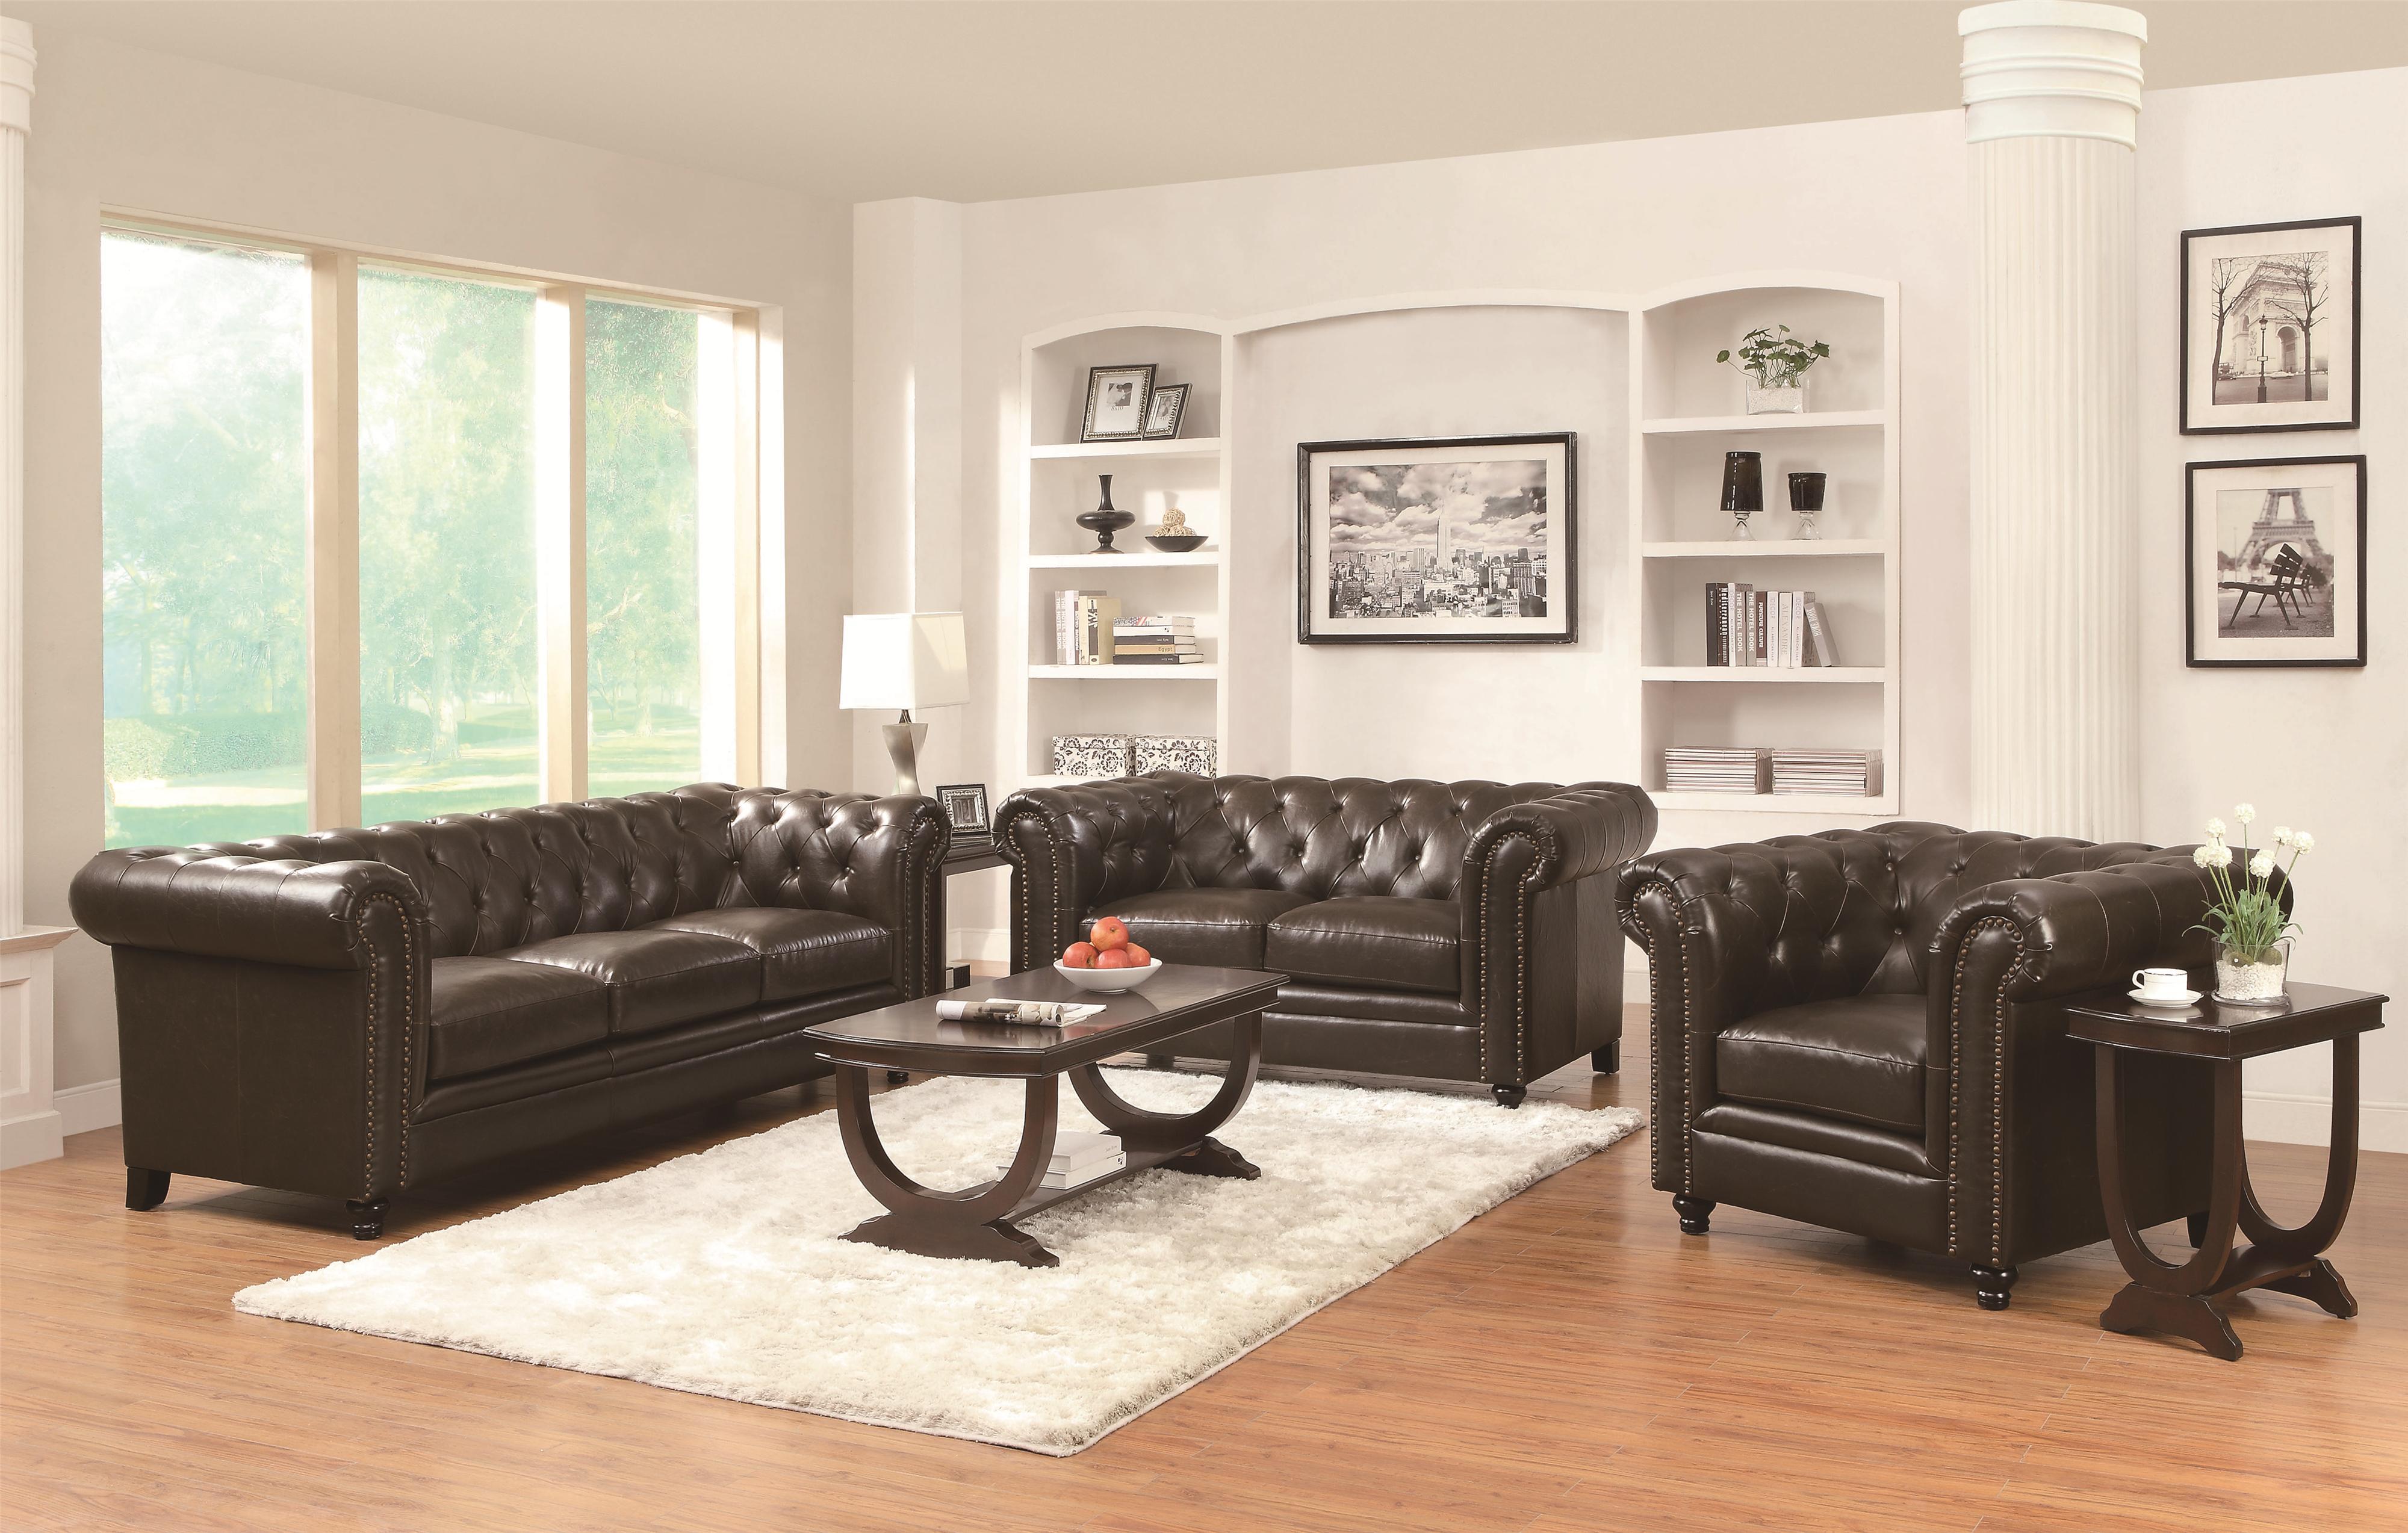 unique claridge fabric abbyson sofa free velvet grey couch hypermallapartments dark of shipping tufted fresh